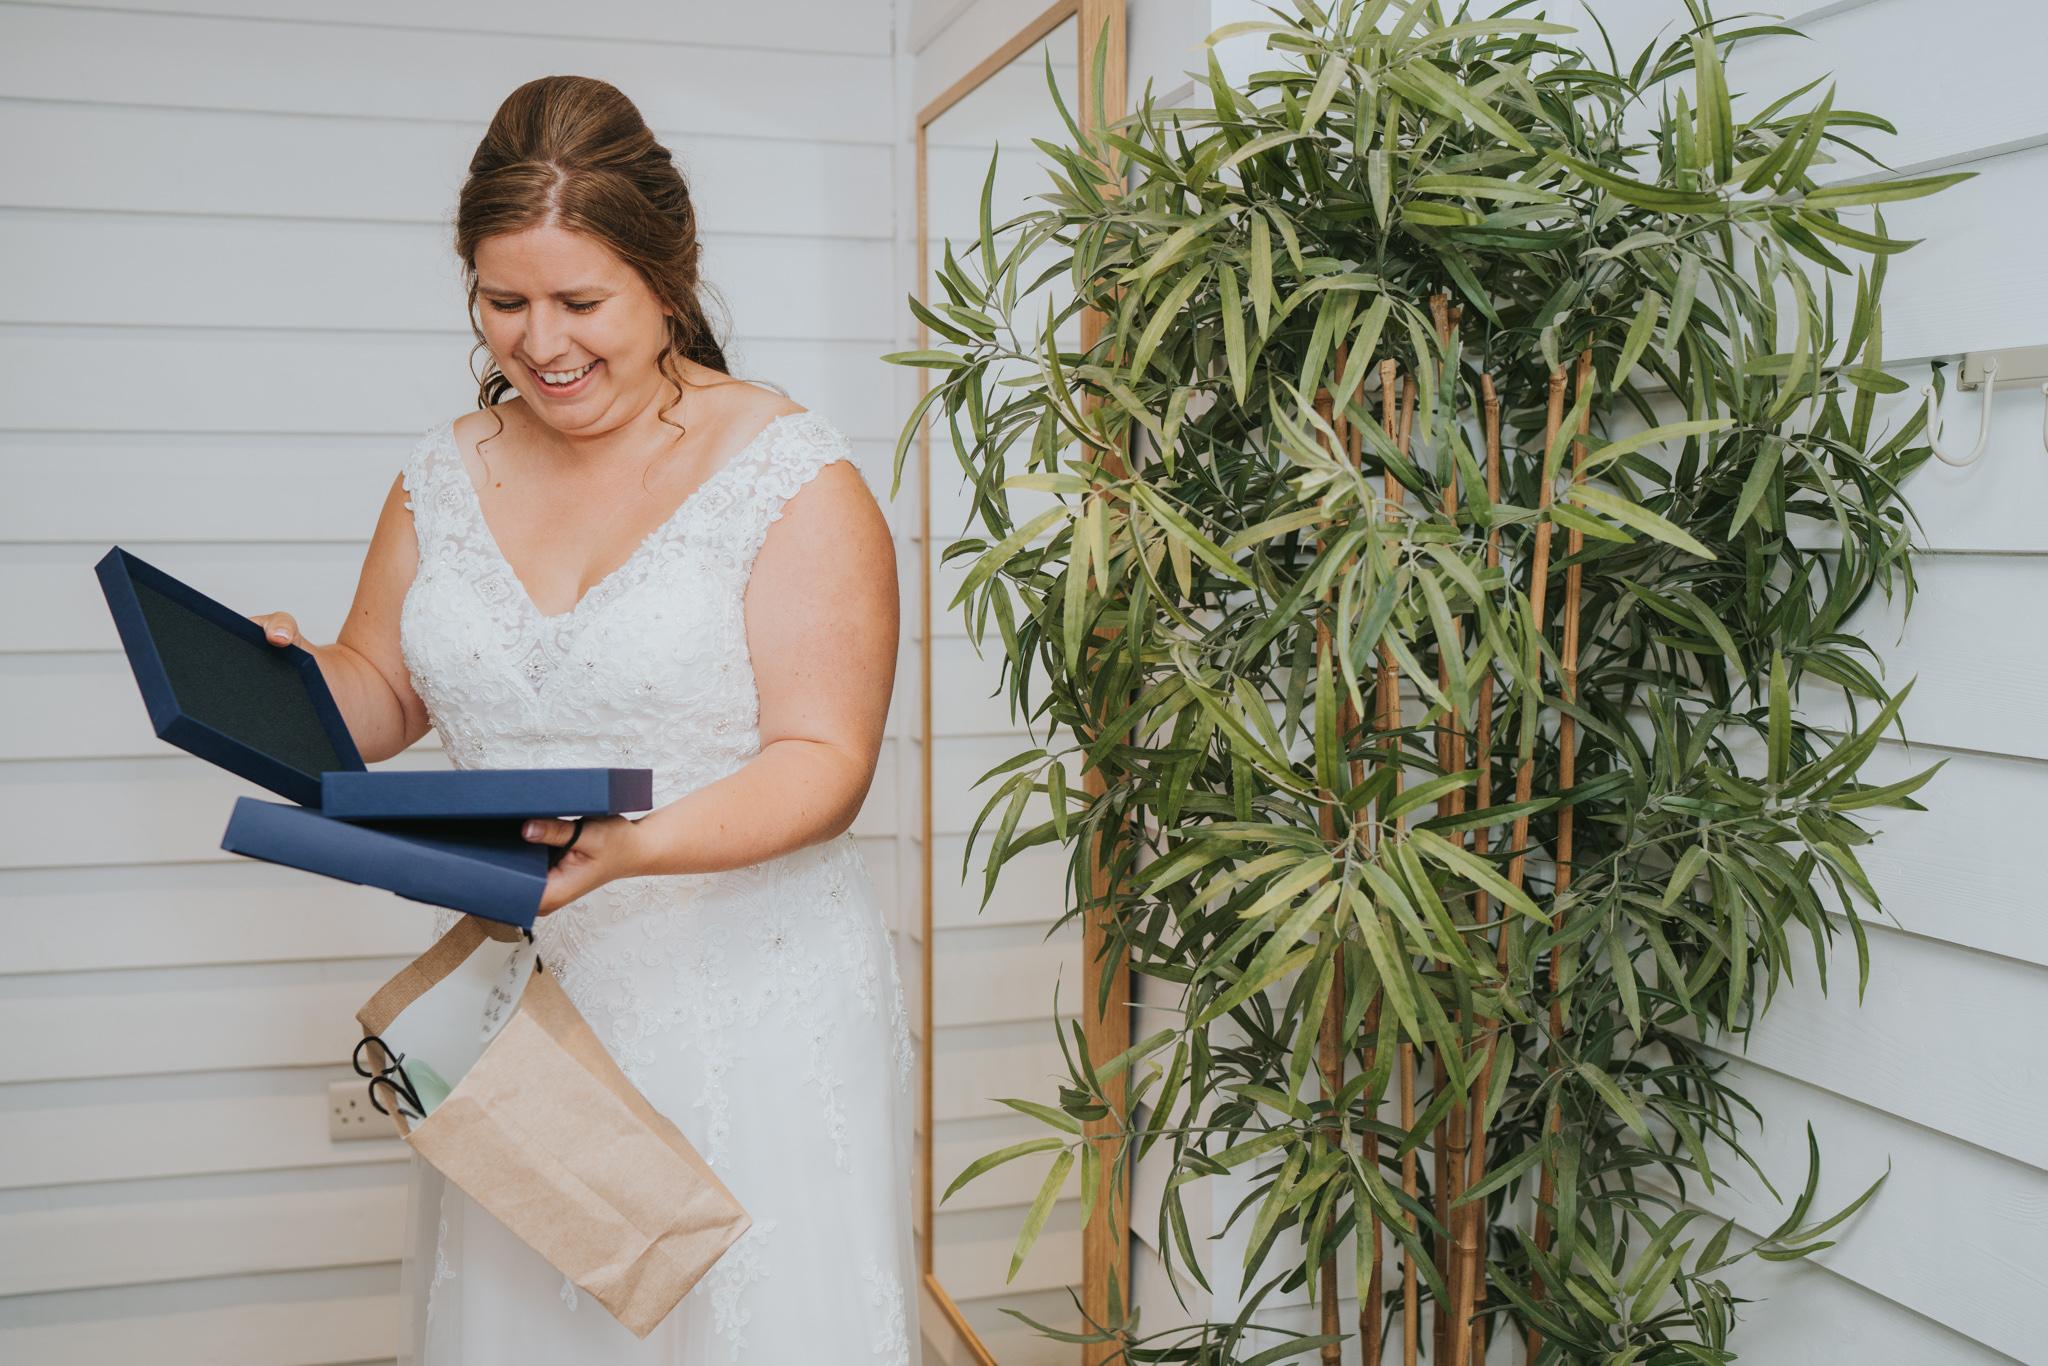 john-amy-relaxed-beach-wedding-tunnels-beaches-ilfracombe-north-devon-grace-elizabeth-colchester-essex-alternative-relaxed-wedding-photography-devon-suffolk-norfolk-essex (38 of 159).jpg